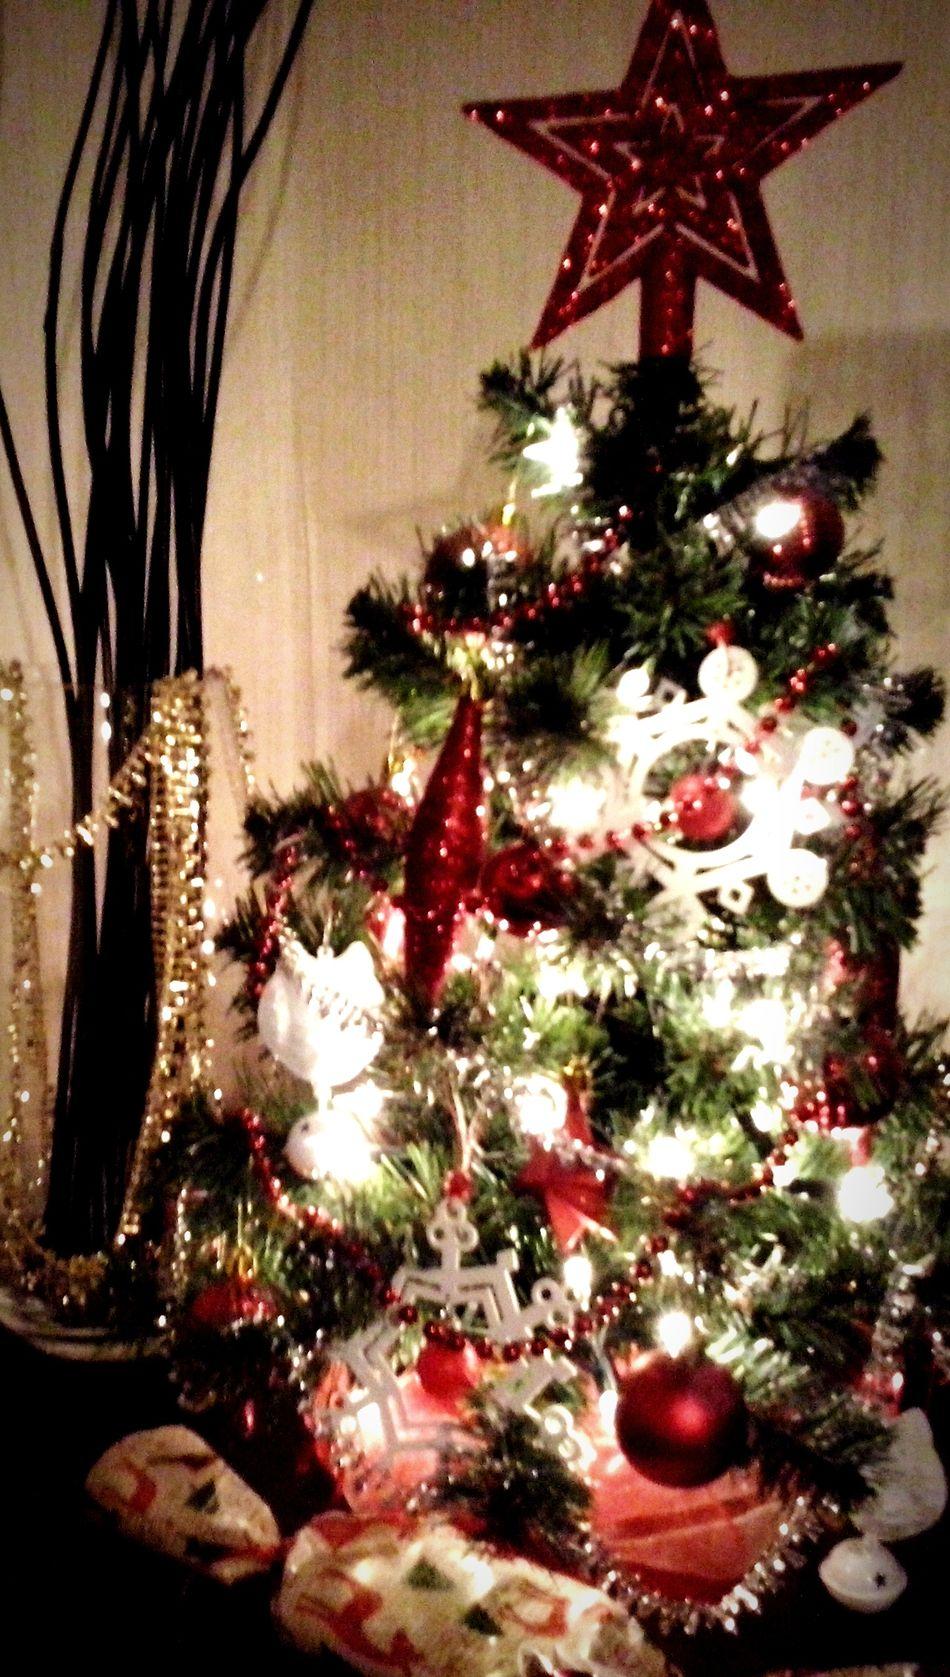 Christmas Tree Merry Christmas! Hello World my tree:)